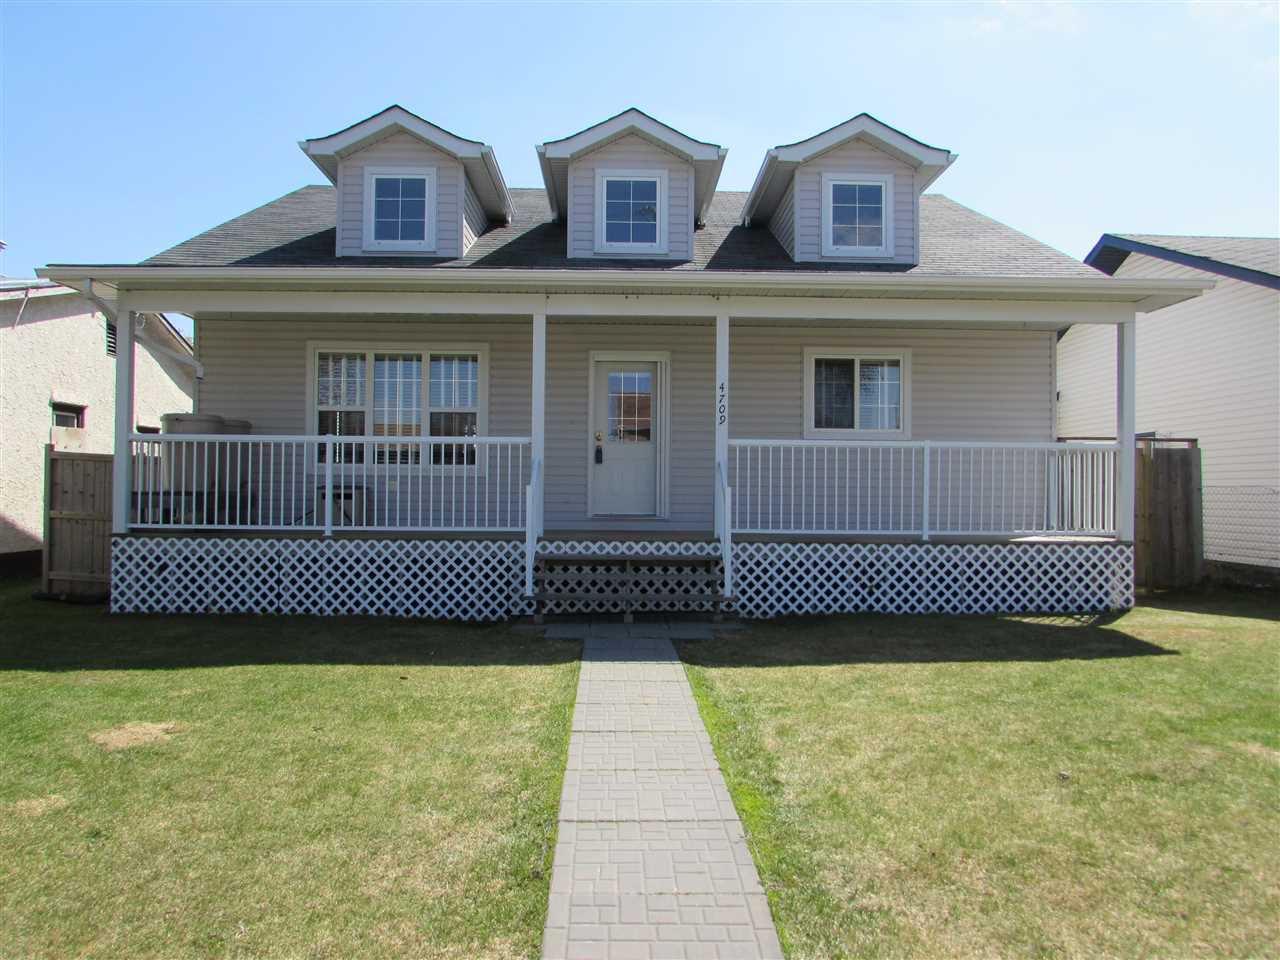 Main Photo: 4709 49 Avenue: Legal House for sale : MLS®# E4189649